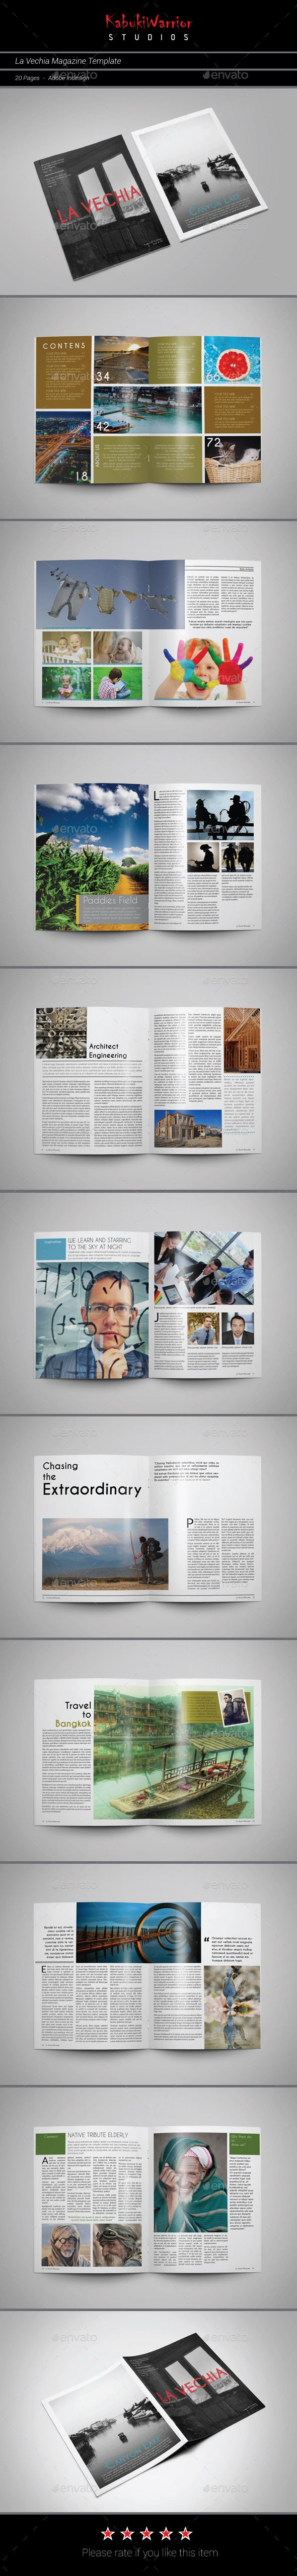 La Vechia Magazine Template | Template, Print templates and Font logo